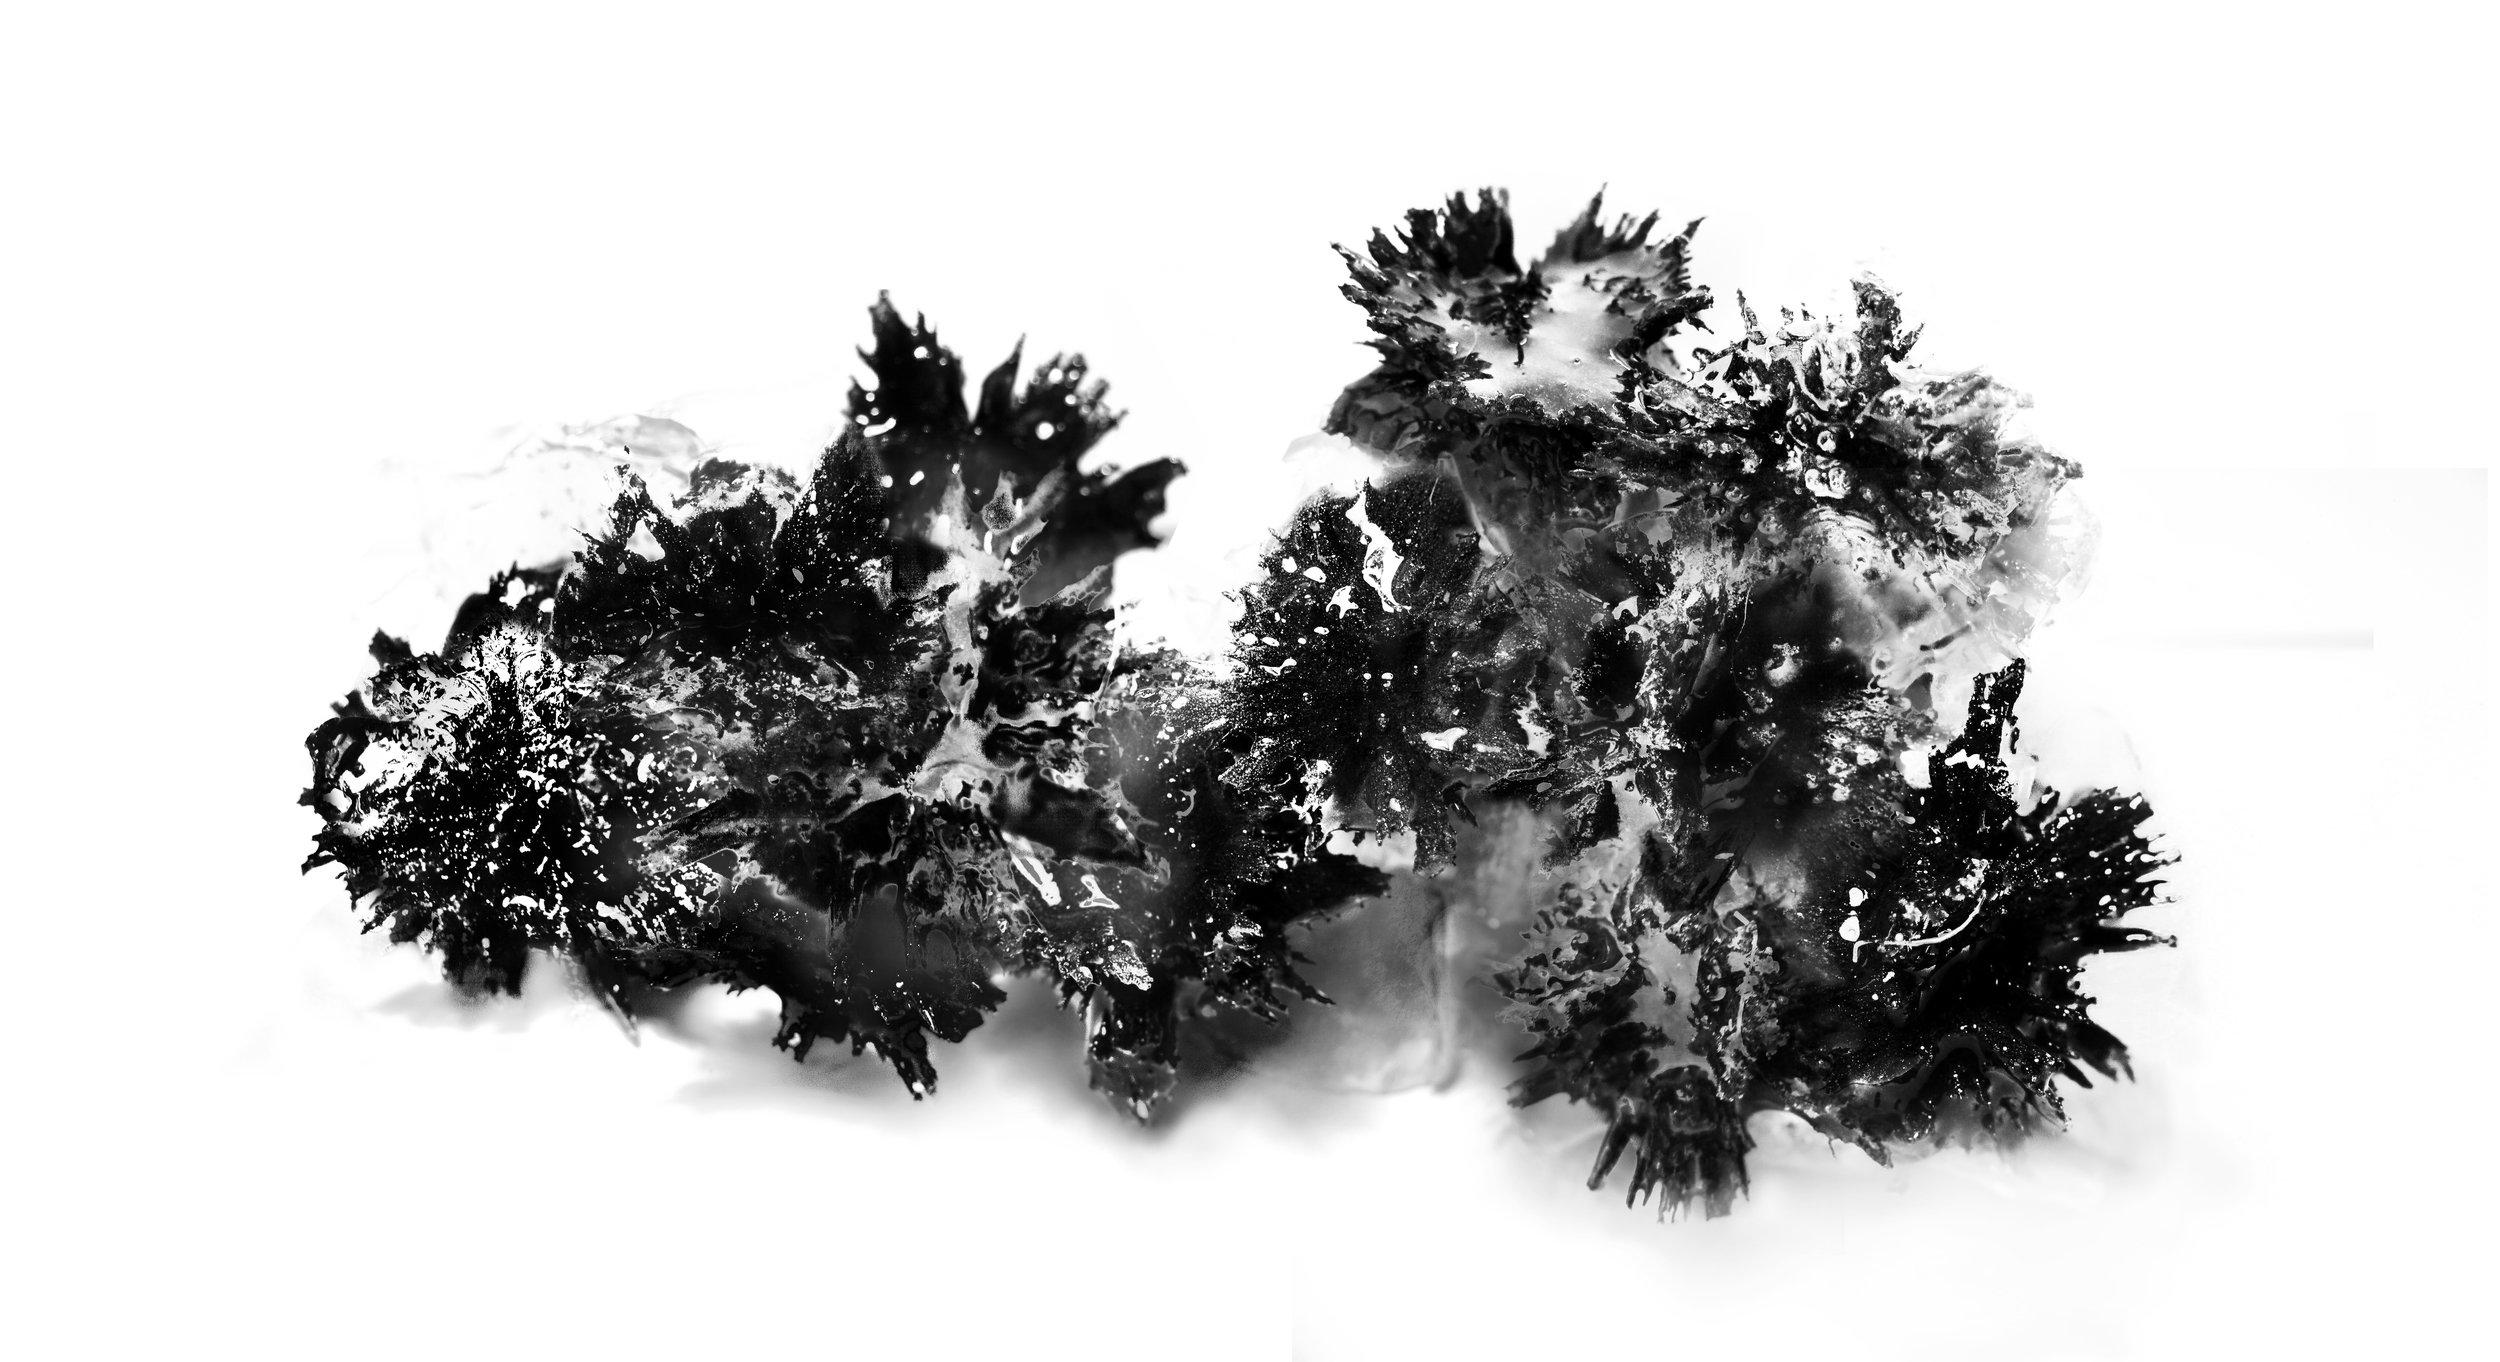 swarm7.jpg